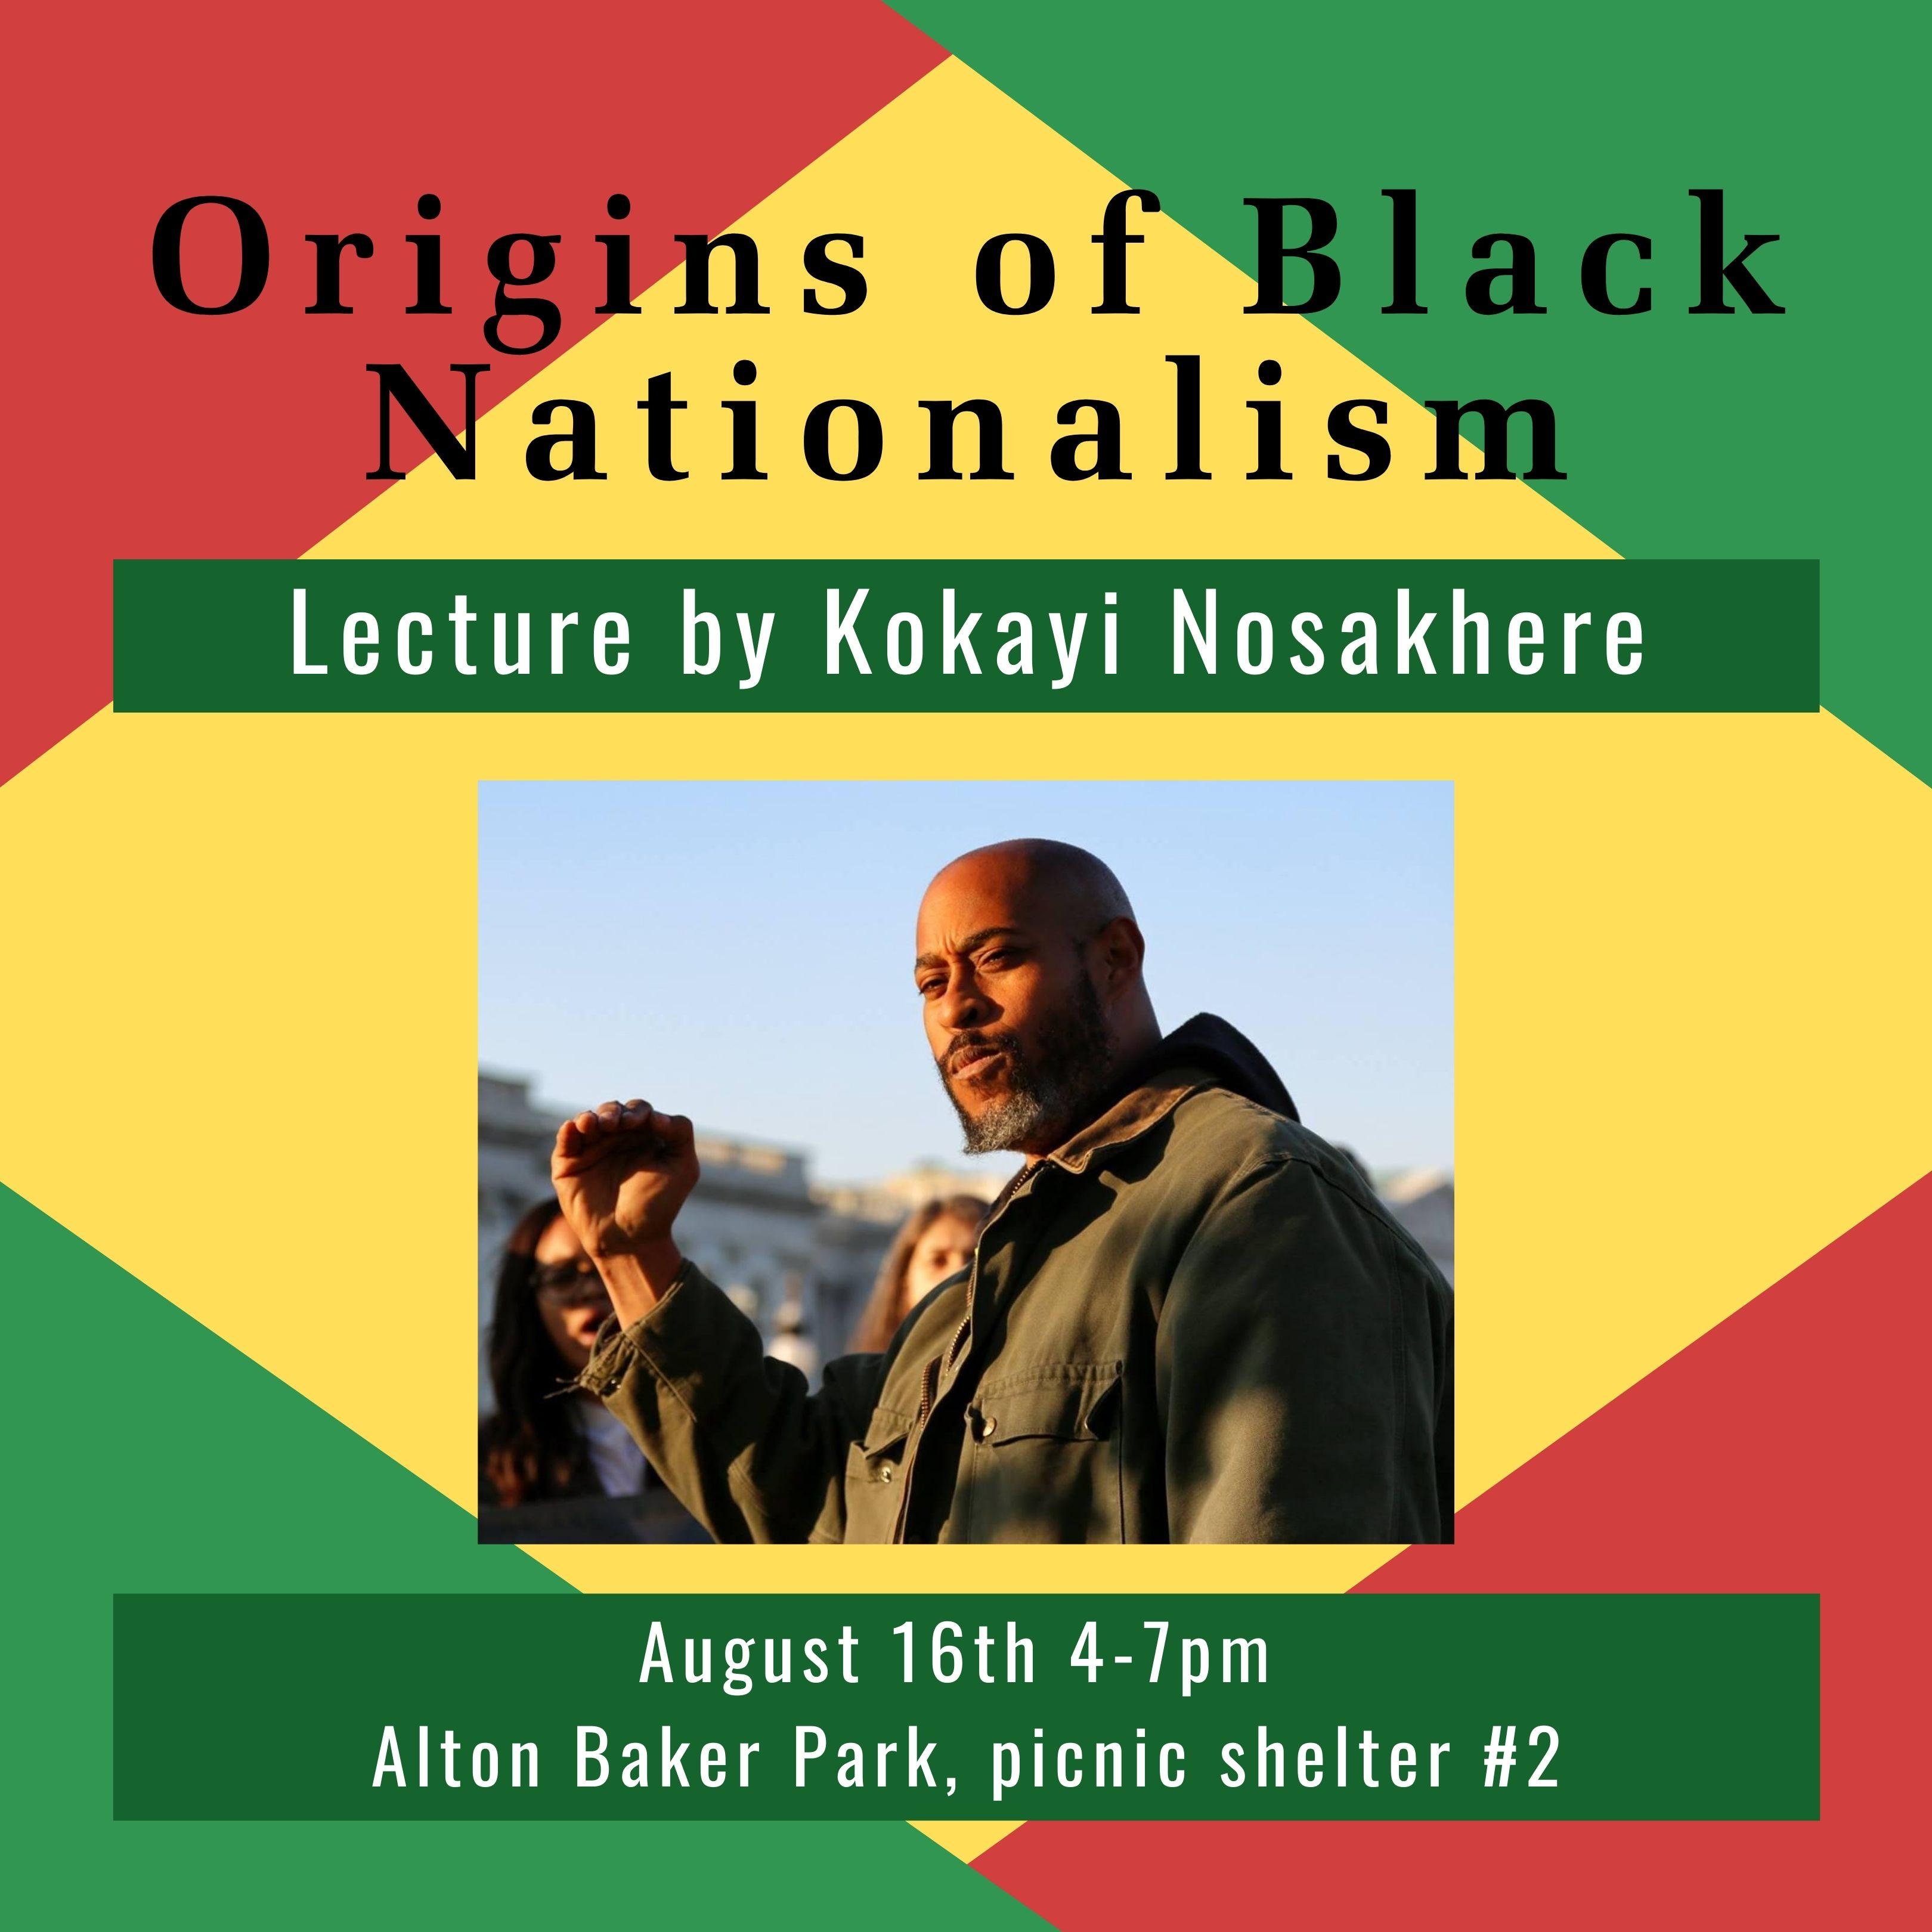 Storyteller Kokayi Nosakhere on the Origins of Black Nationalism